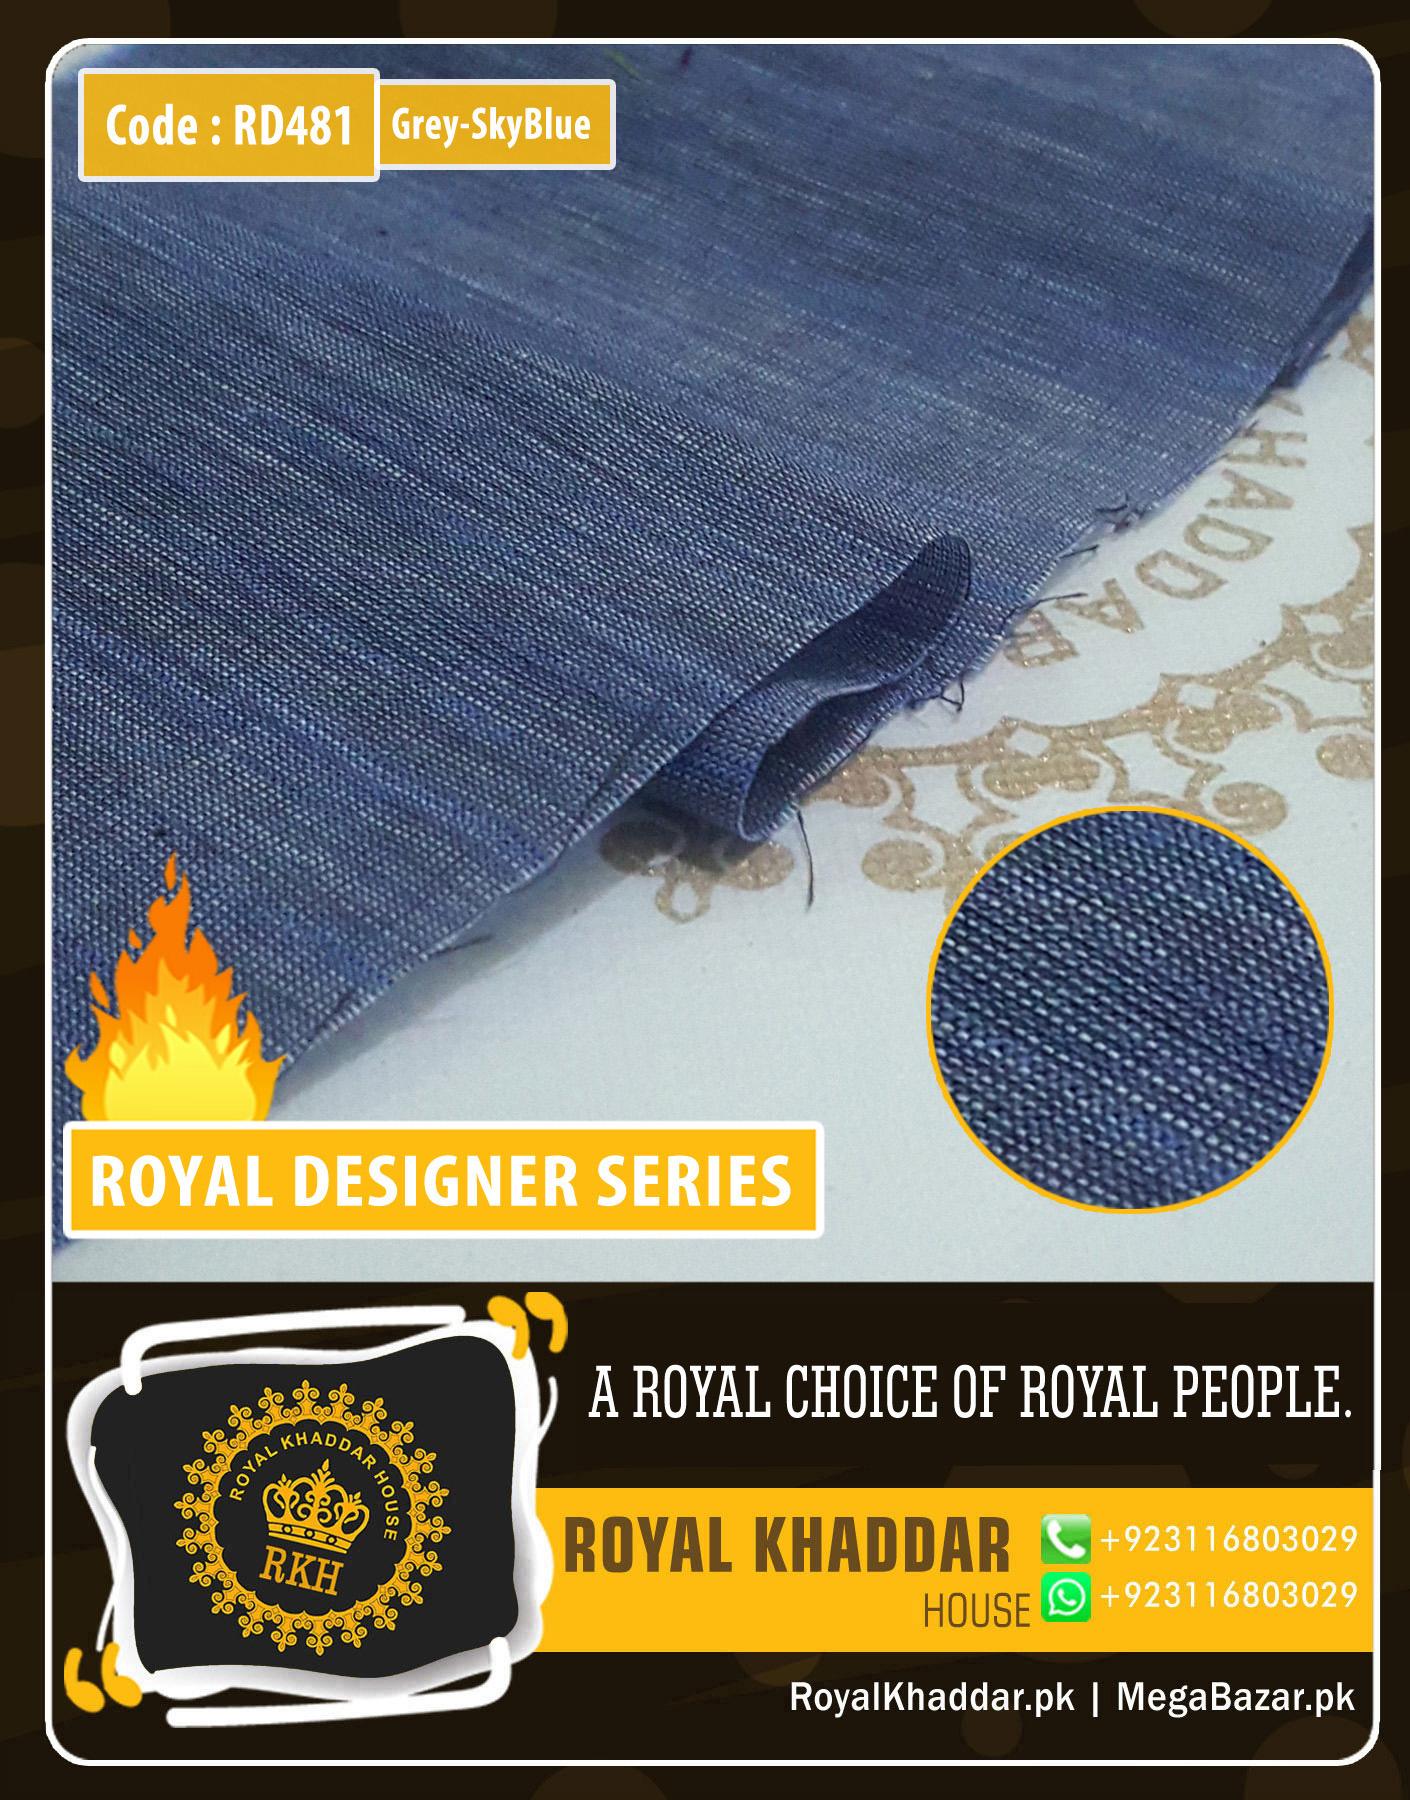 Skyblue Grey Royal Summer Designer Khaddar RD481